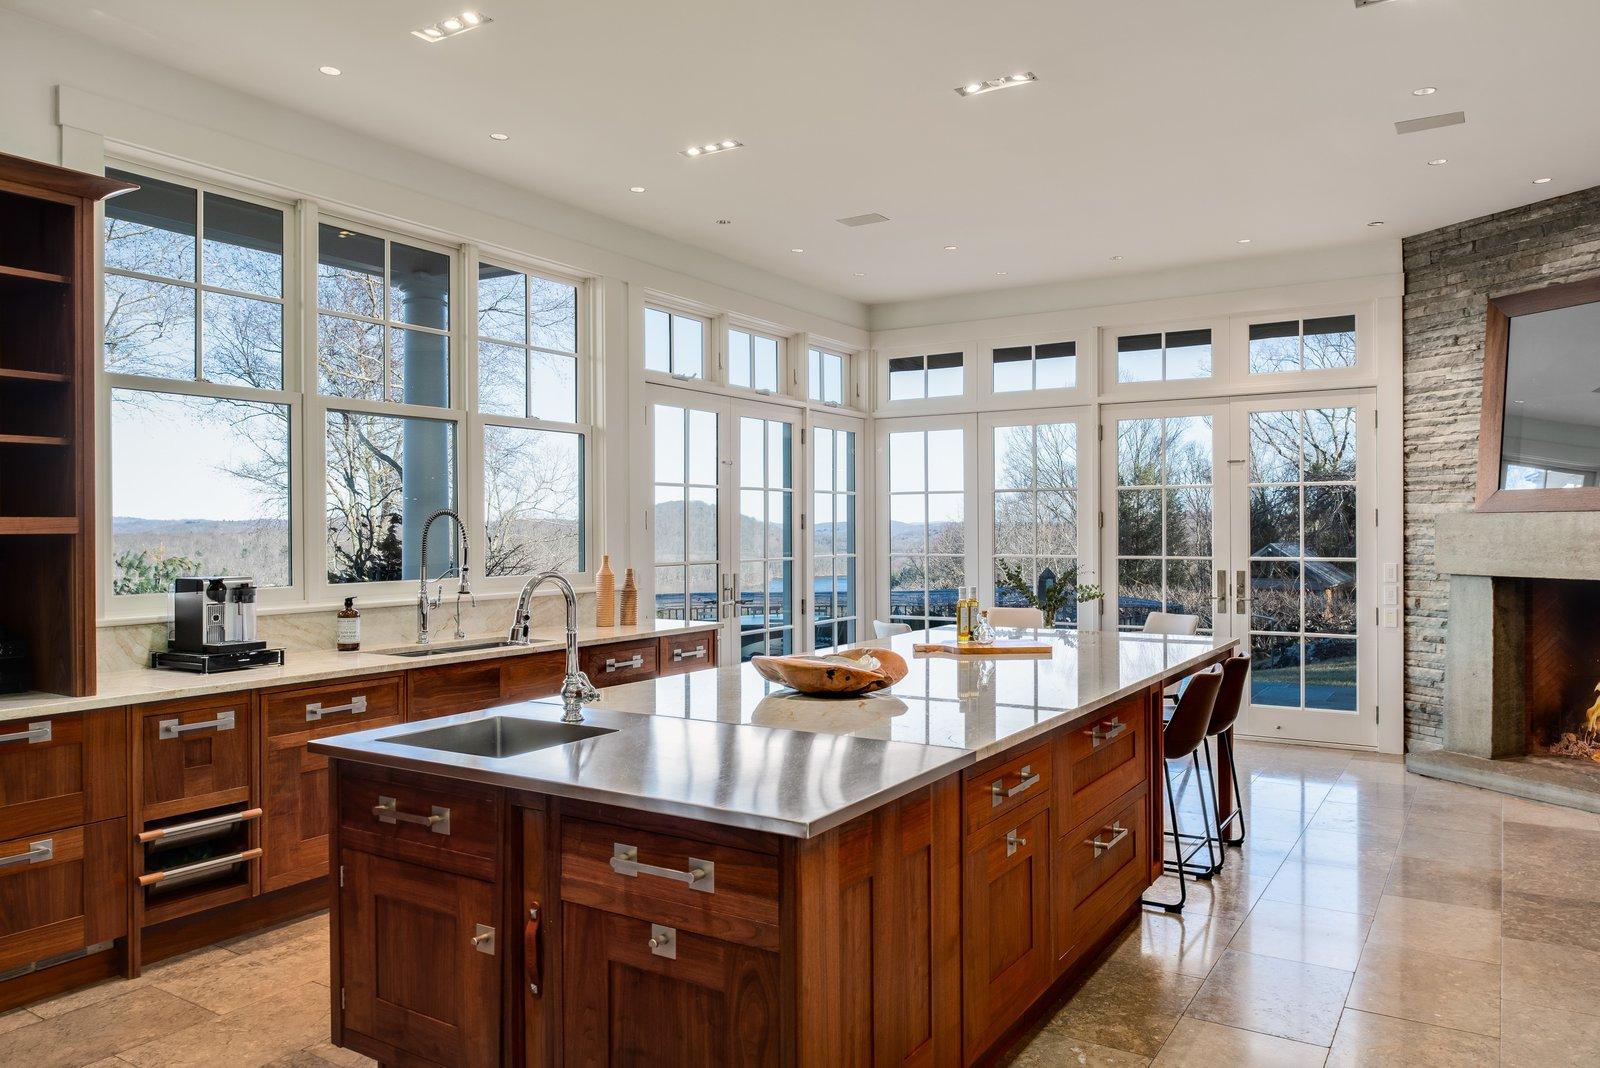 Bruce Willis Emma Hemming Bedford Corners kitchen